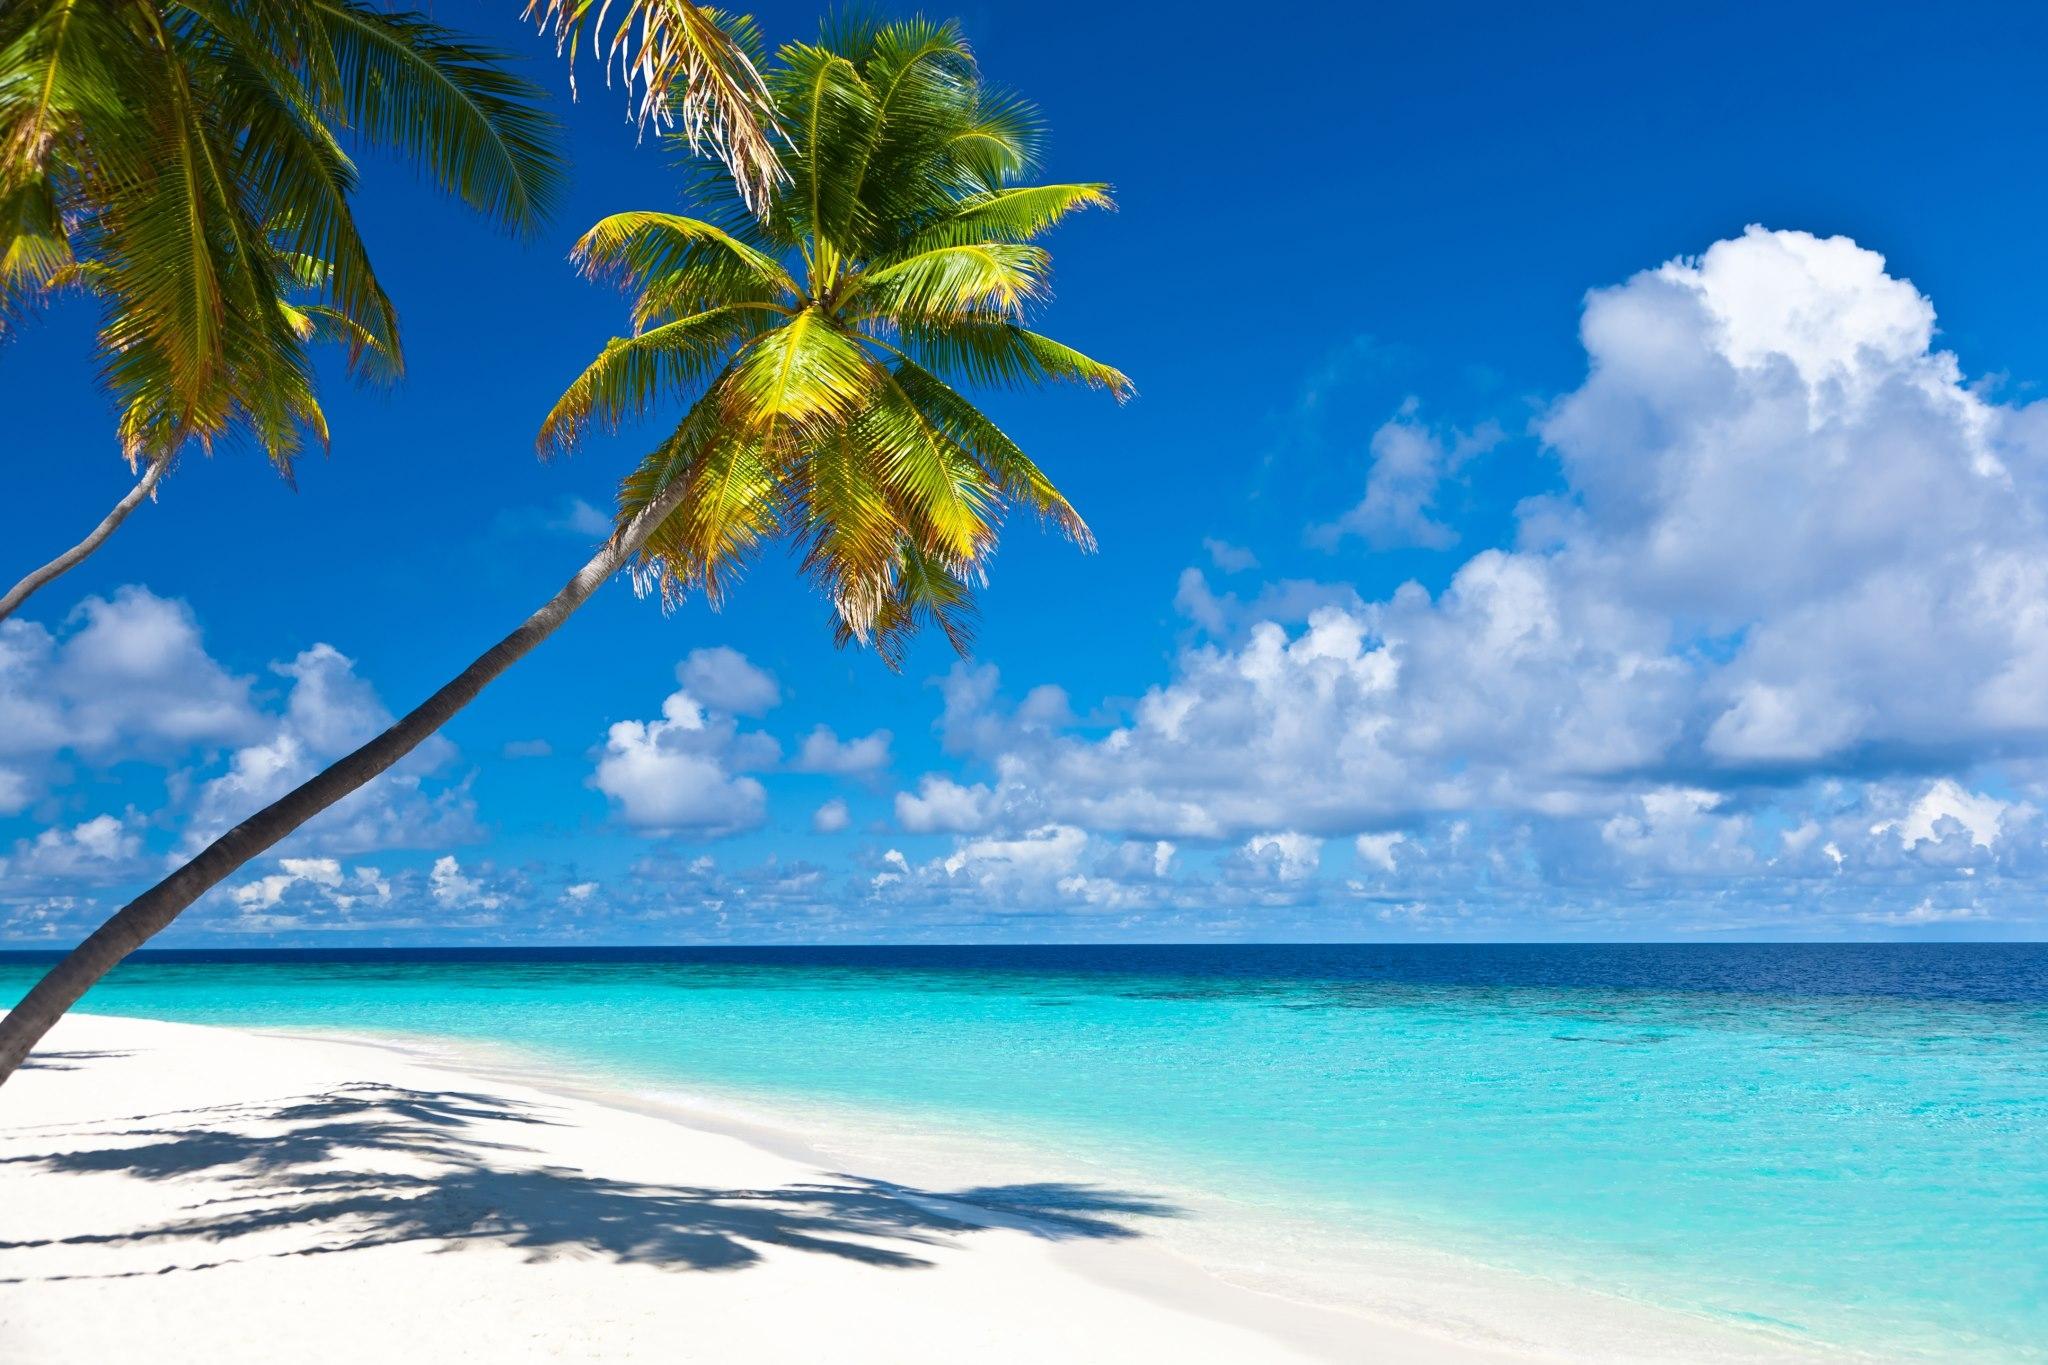 caribbean island postcard wallpaper - photo #43